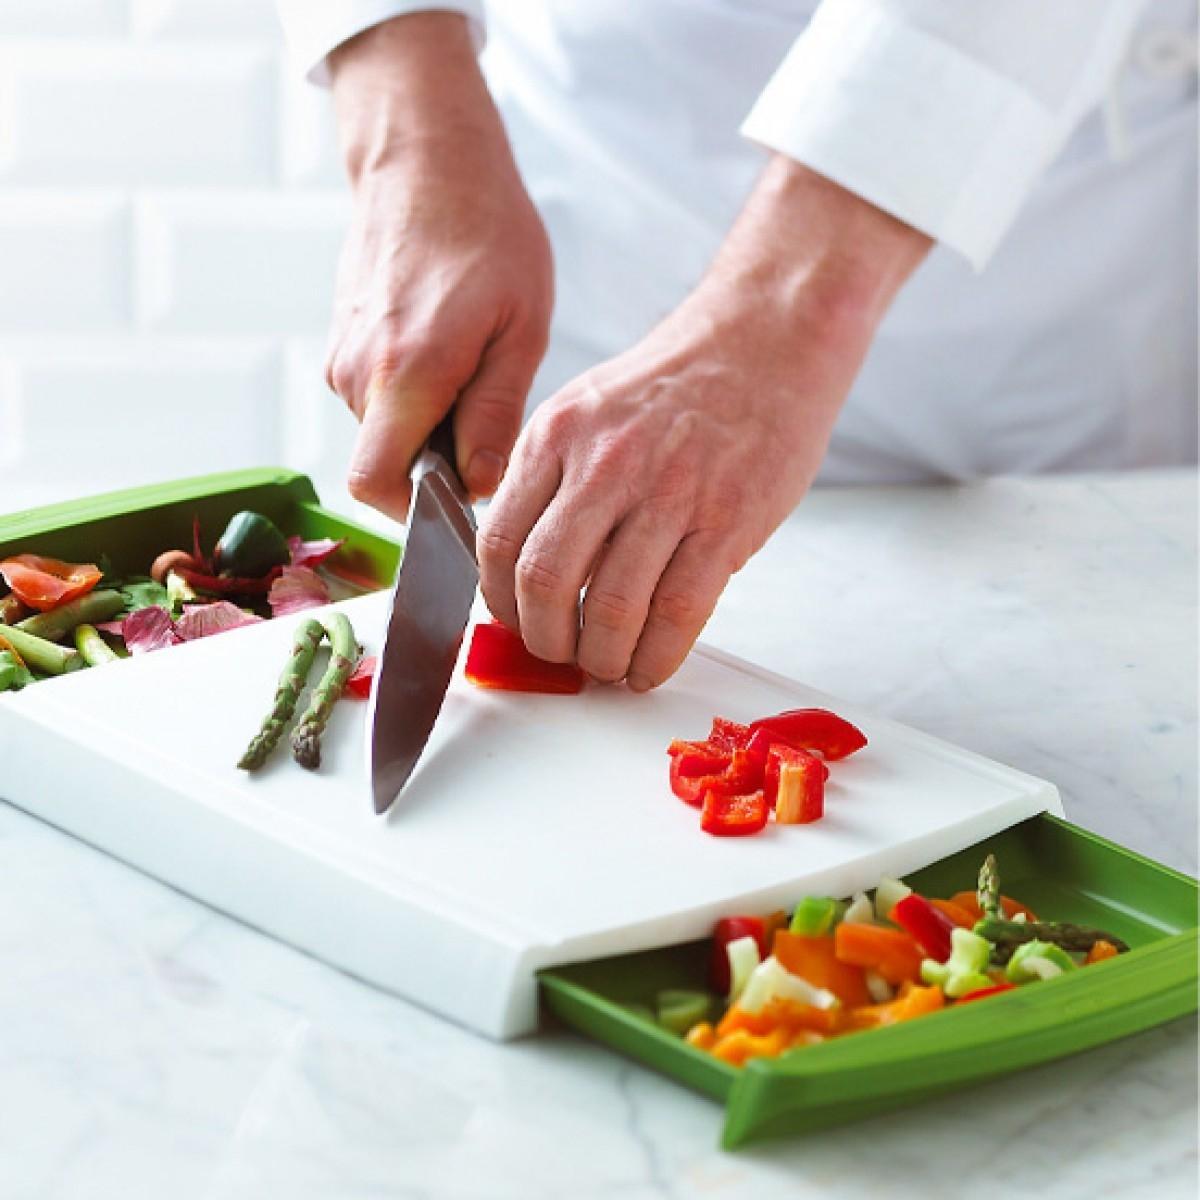 Green & White Chop 'n' Clear Cutting Board.